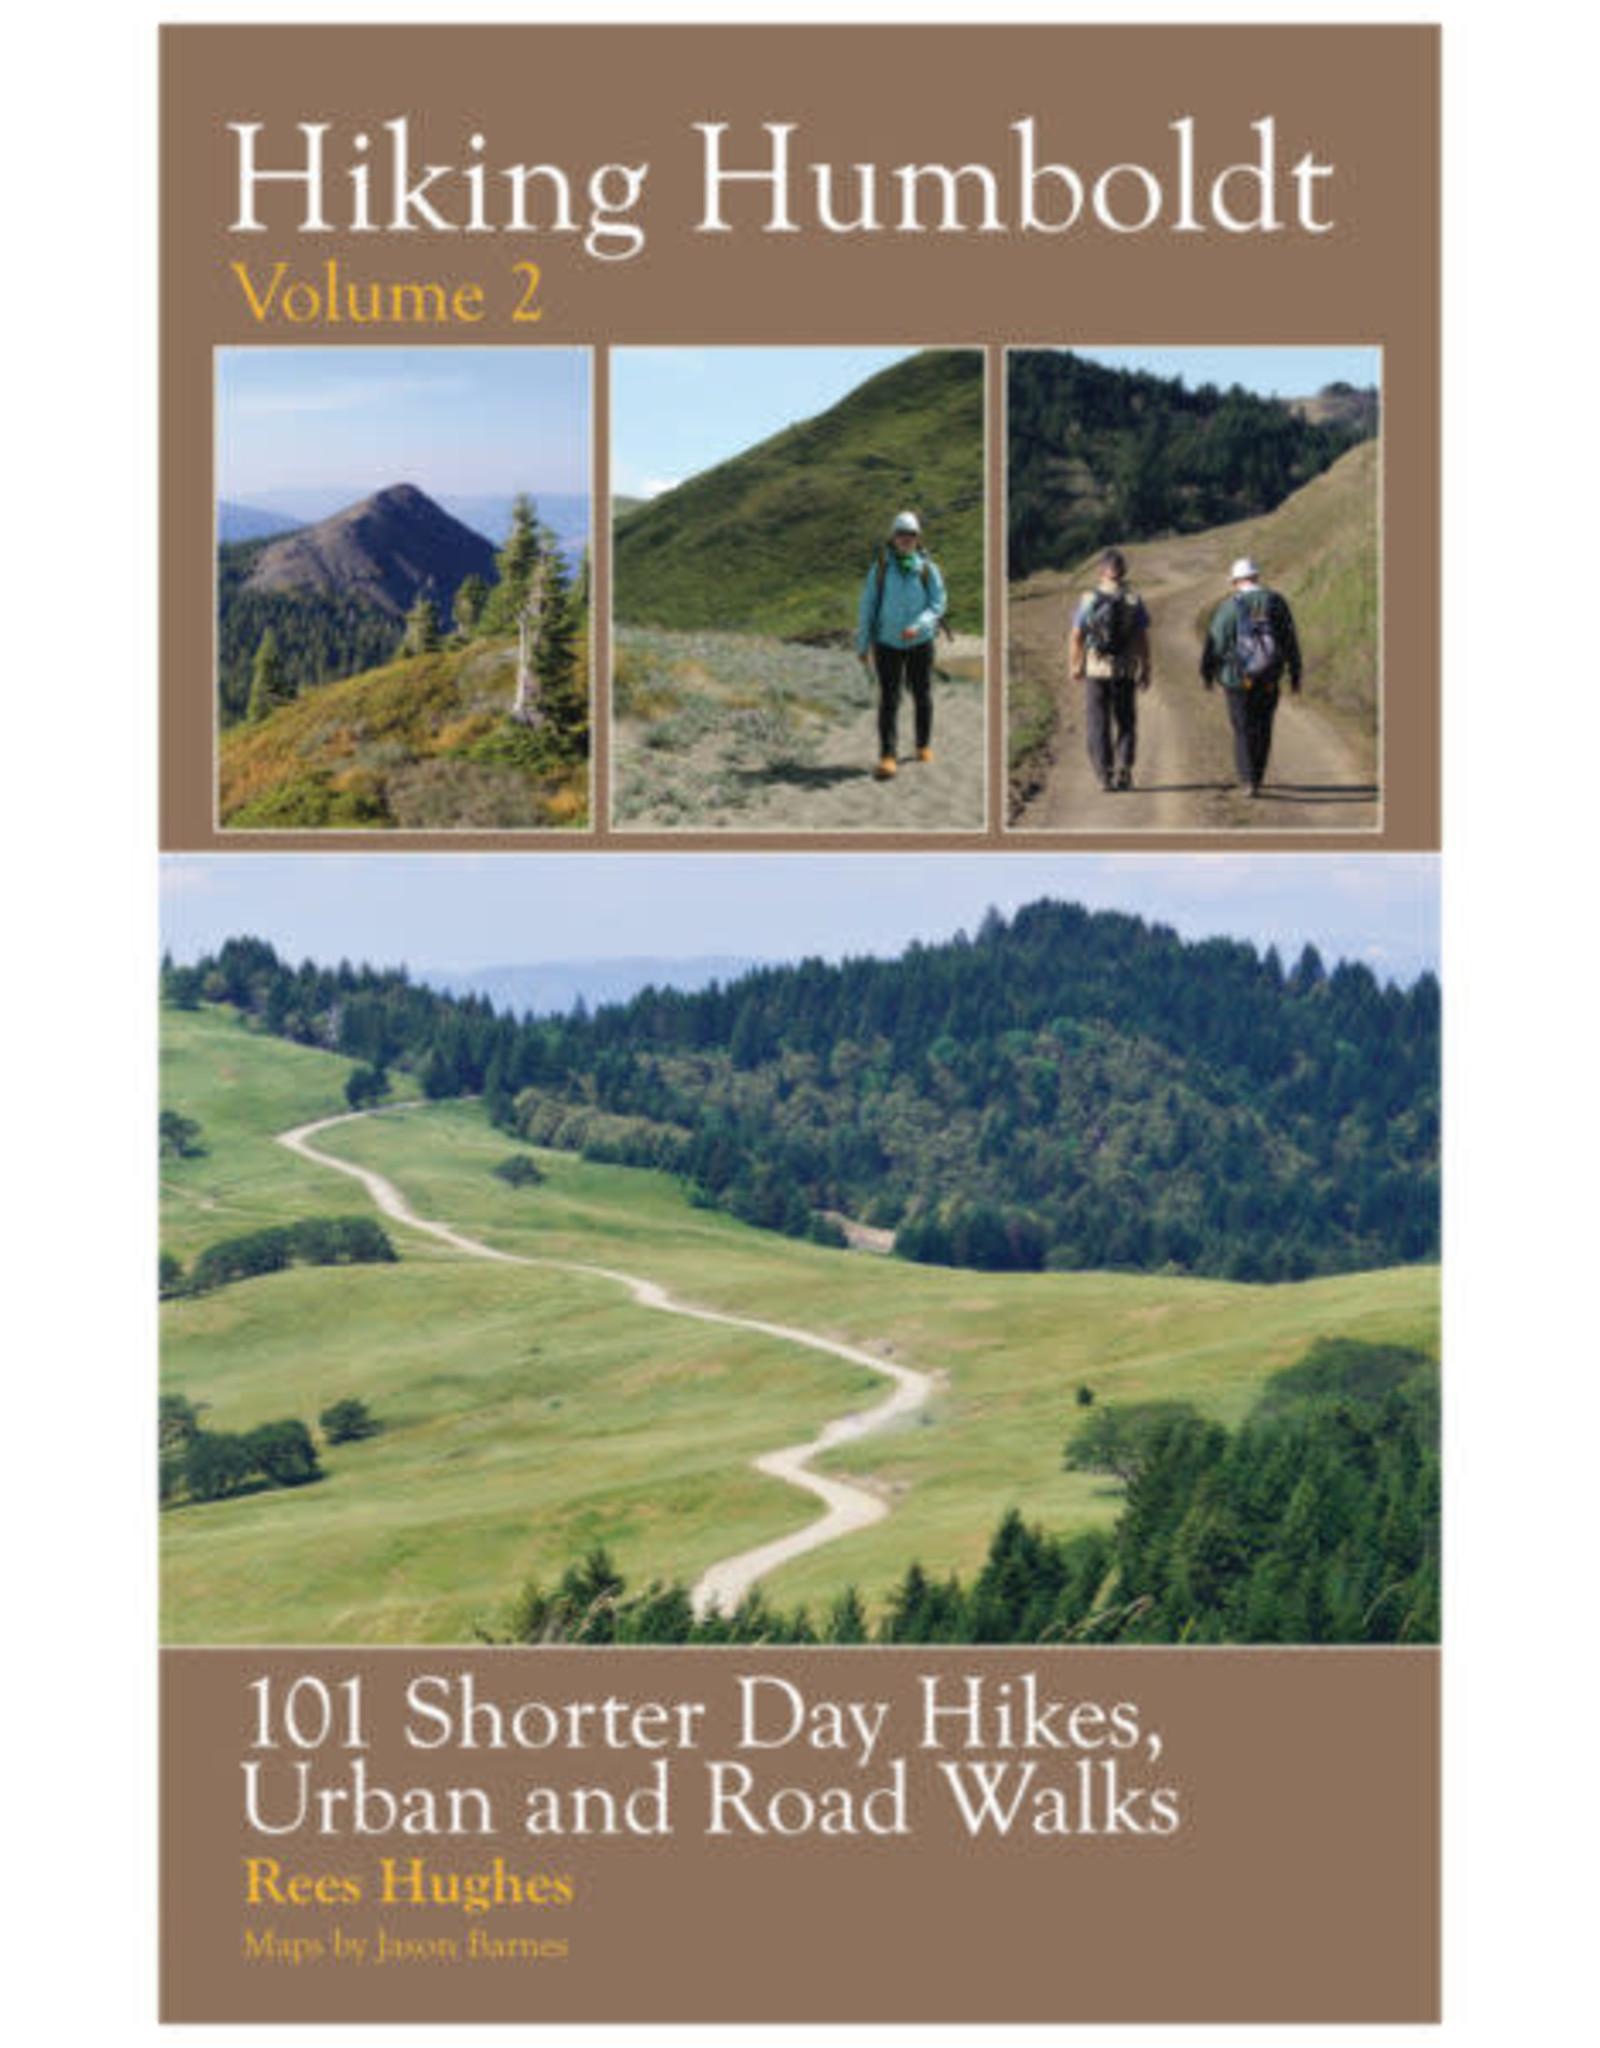 BACKCOUNTRY PRESS Hiking Humboldt Vol. 2